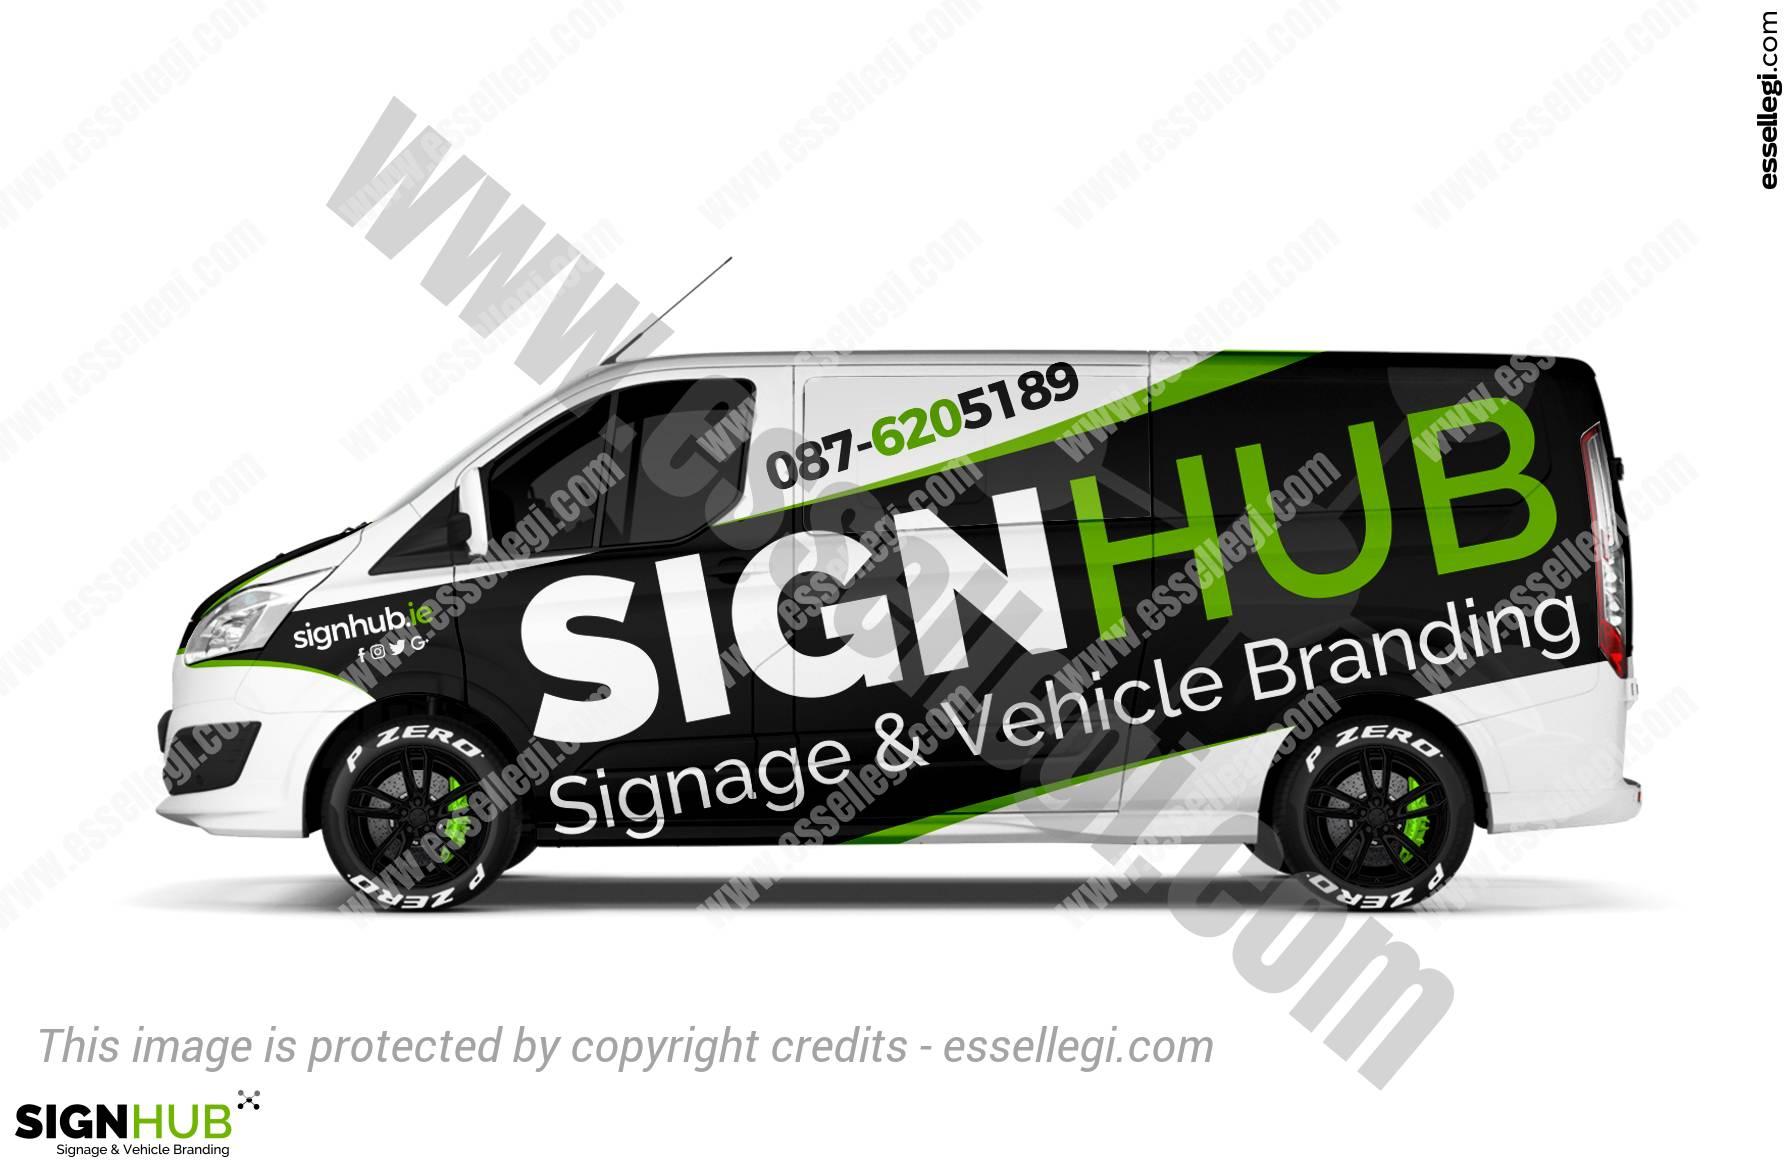 Ford Transit Connect >> Van Wrap Design | Vehicle Wrap Design by Essellegi